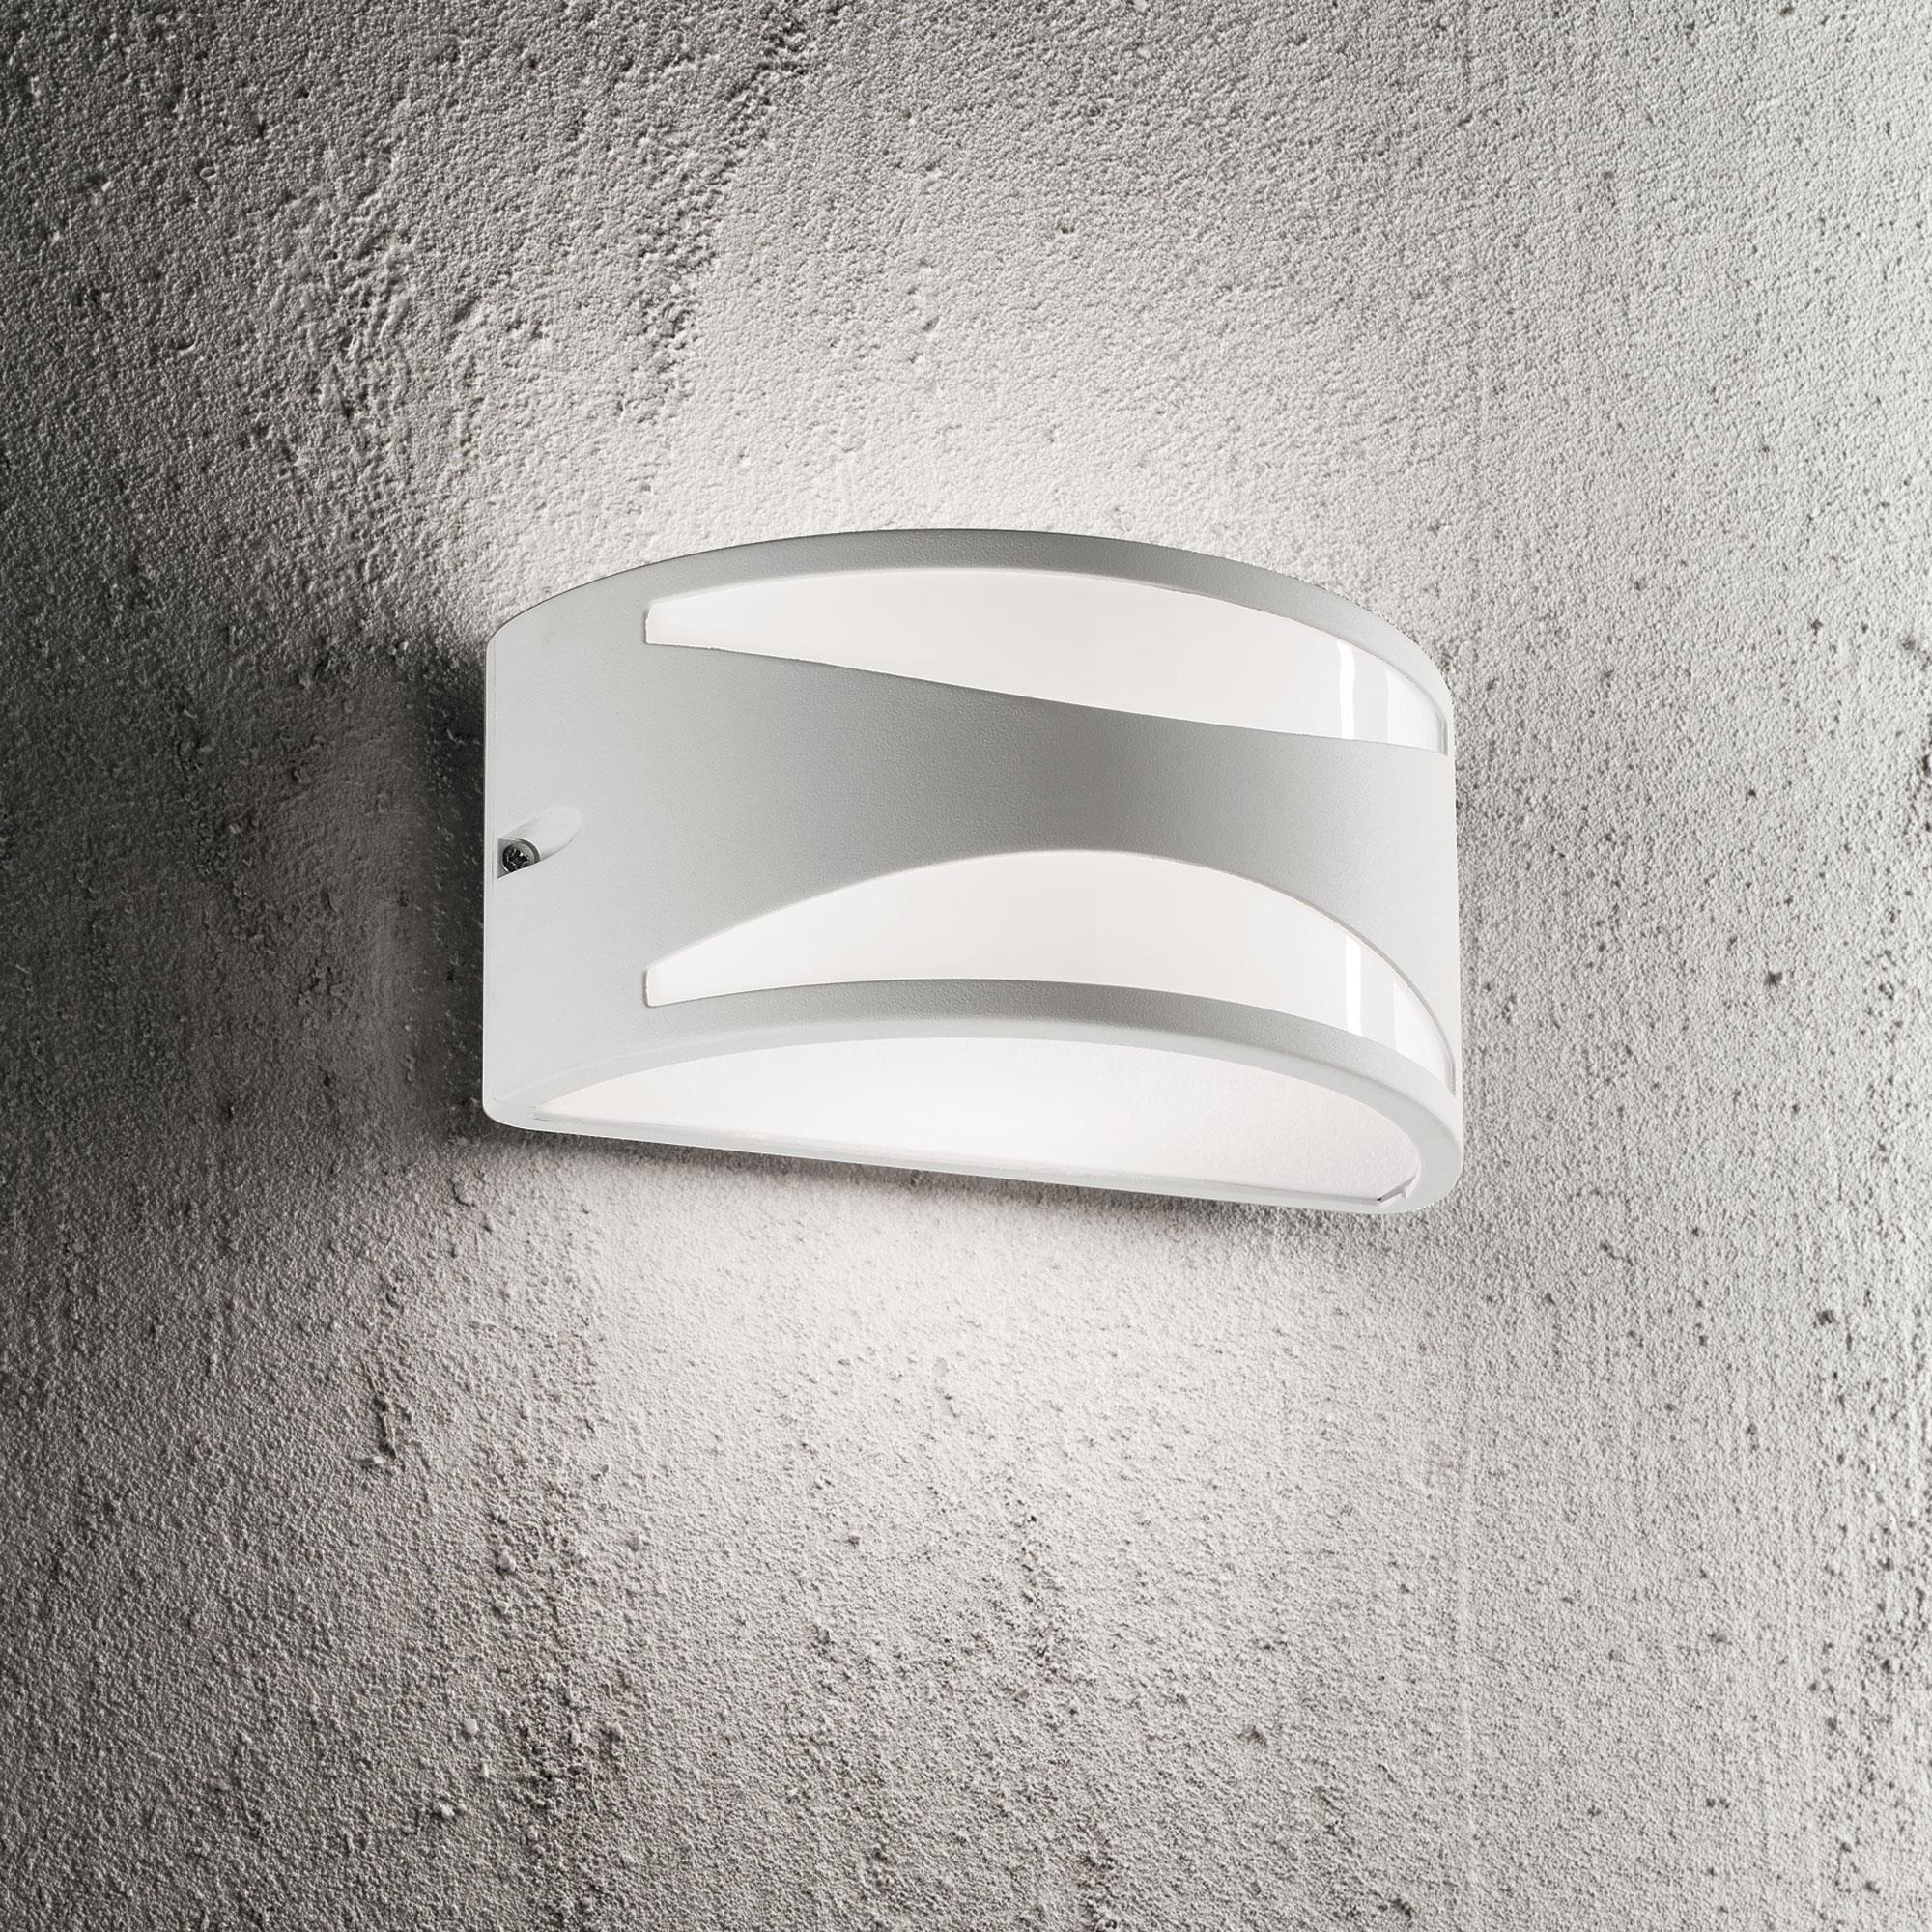 Ideal Lux 092430 Rex-3 AP1 Bianco kerti falilámpa